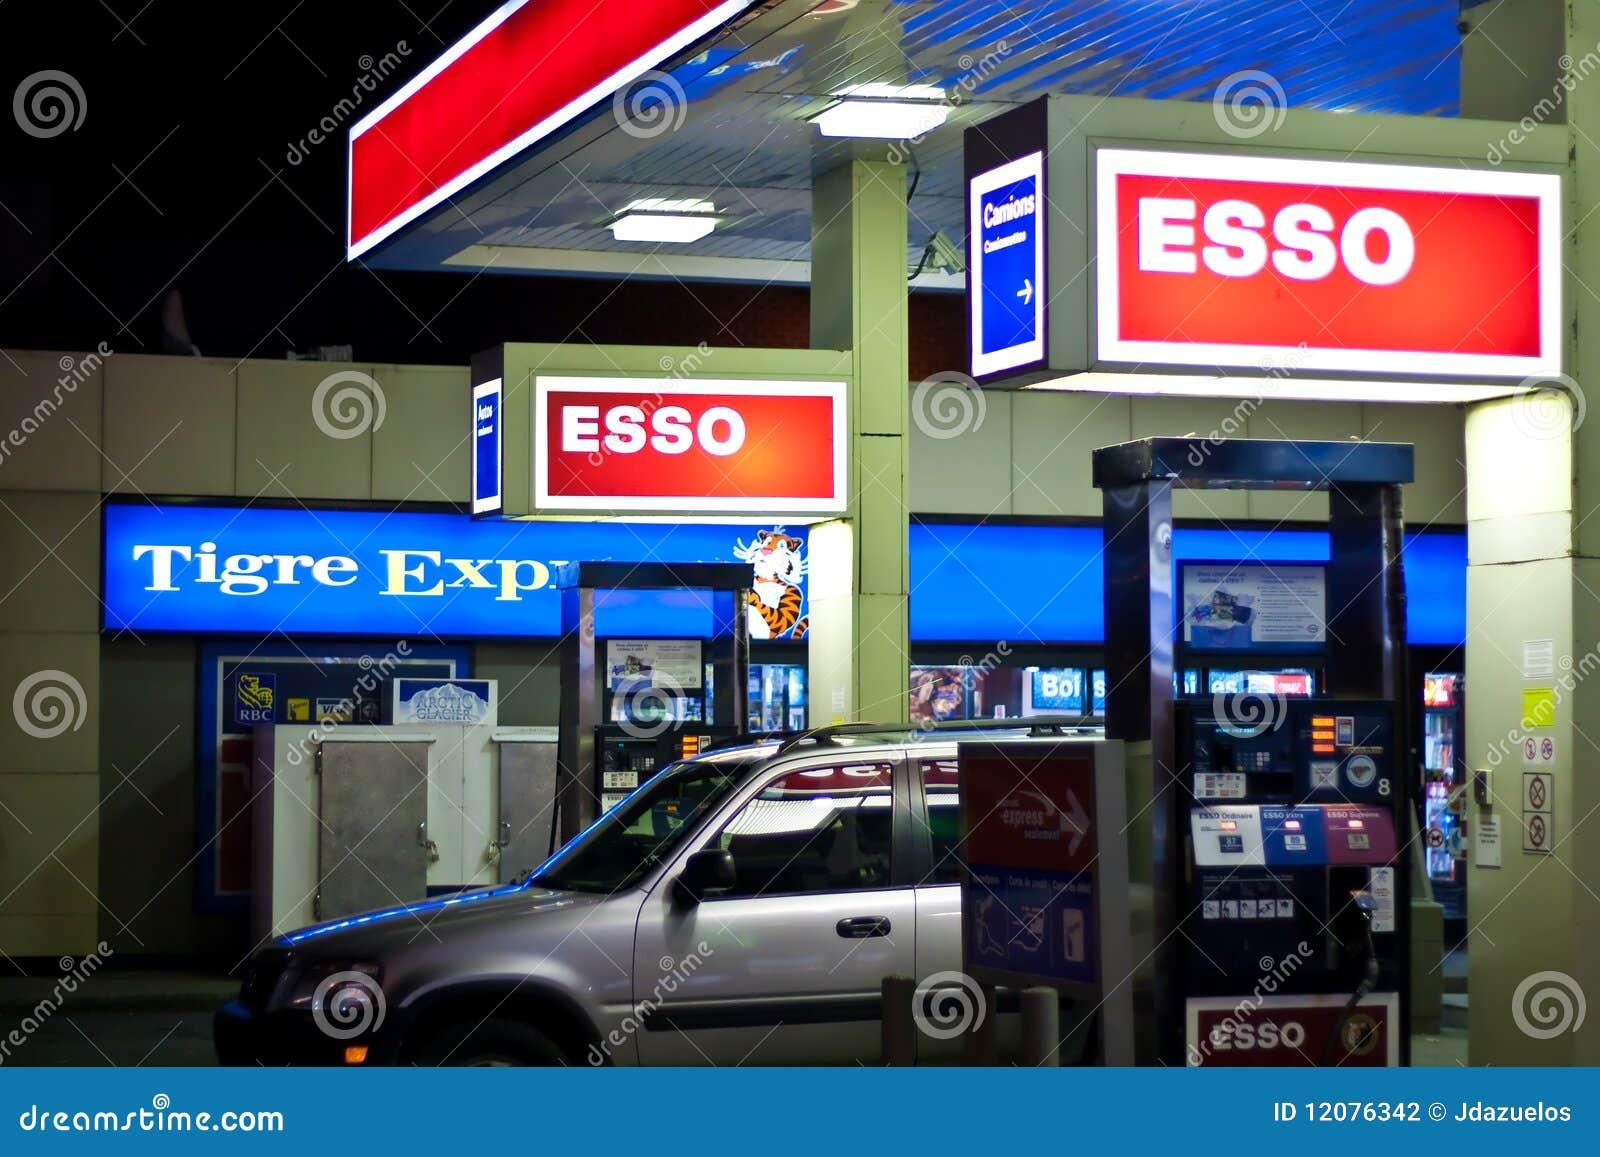 Indian restaurant kitchen design - Esso Gas Station Editorial Photography Image 12076342